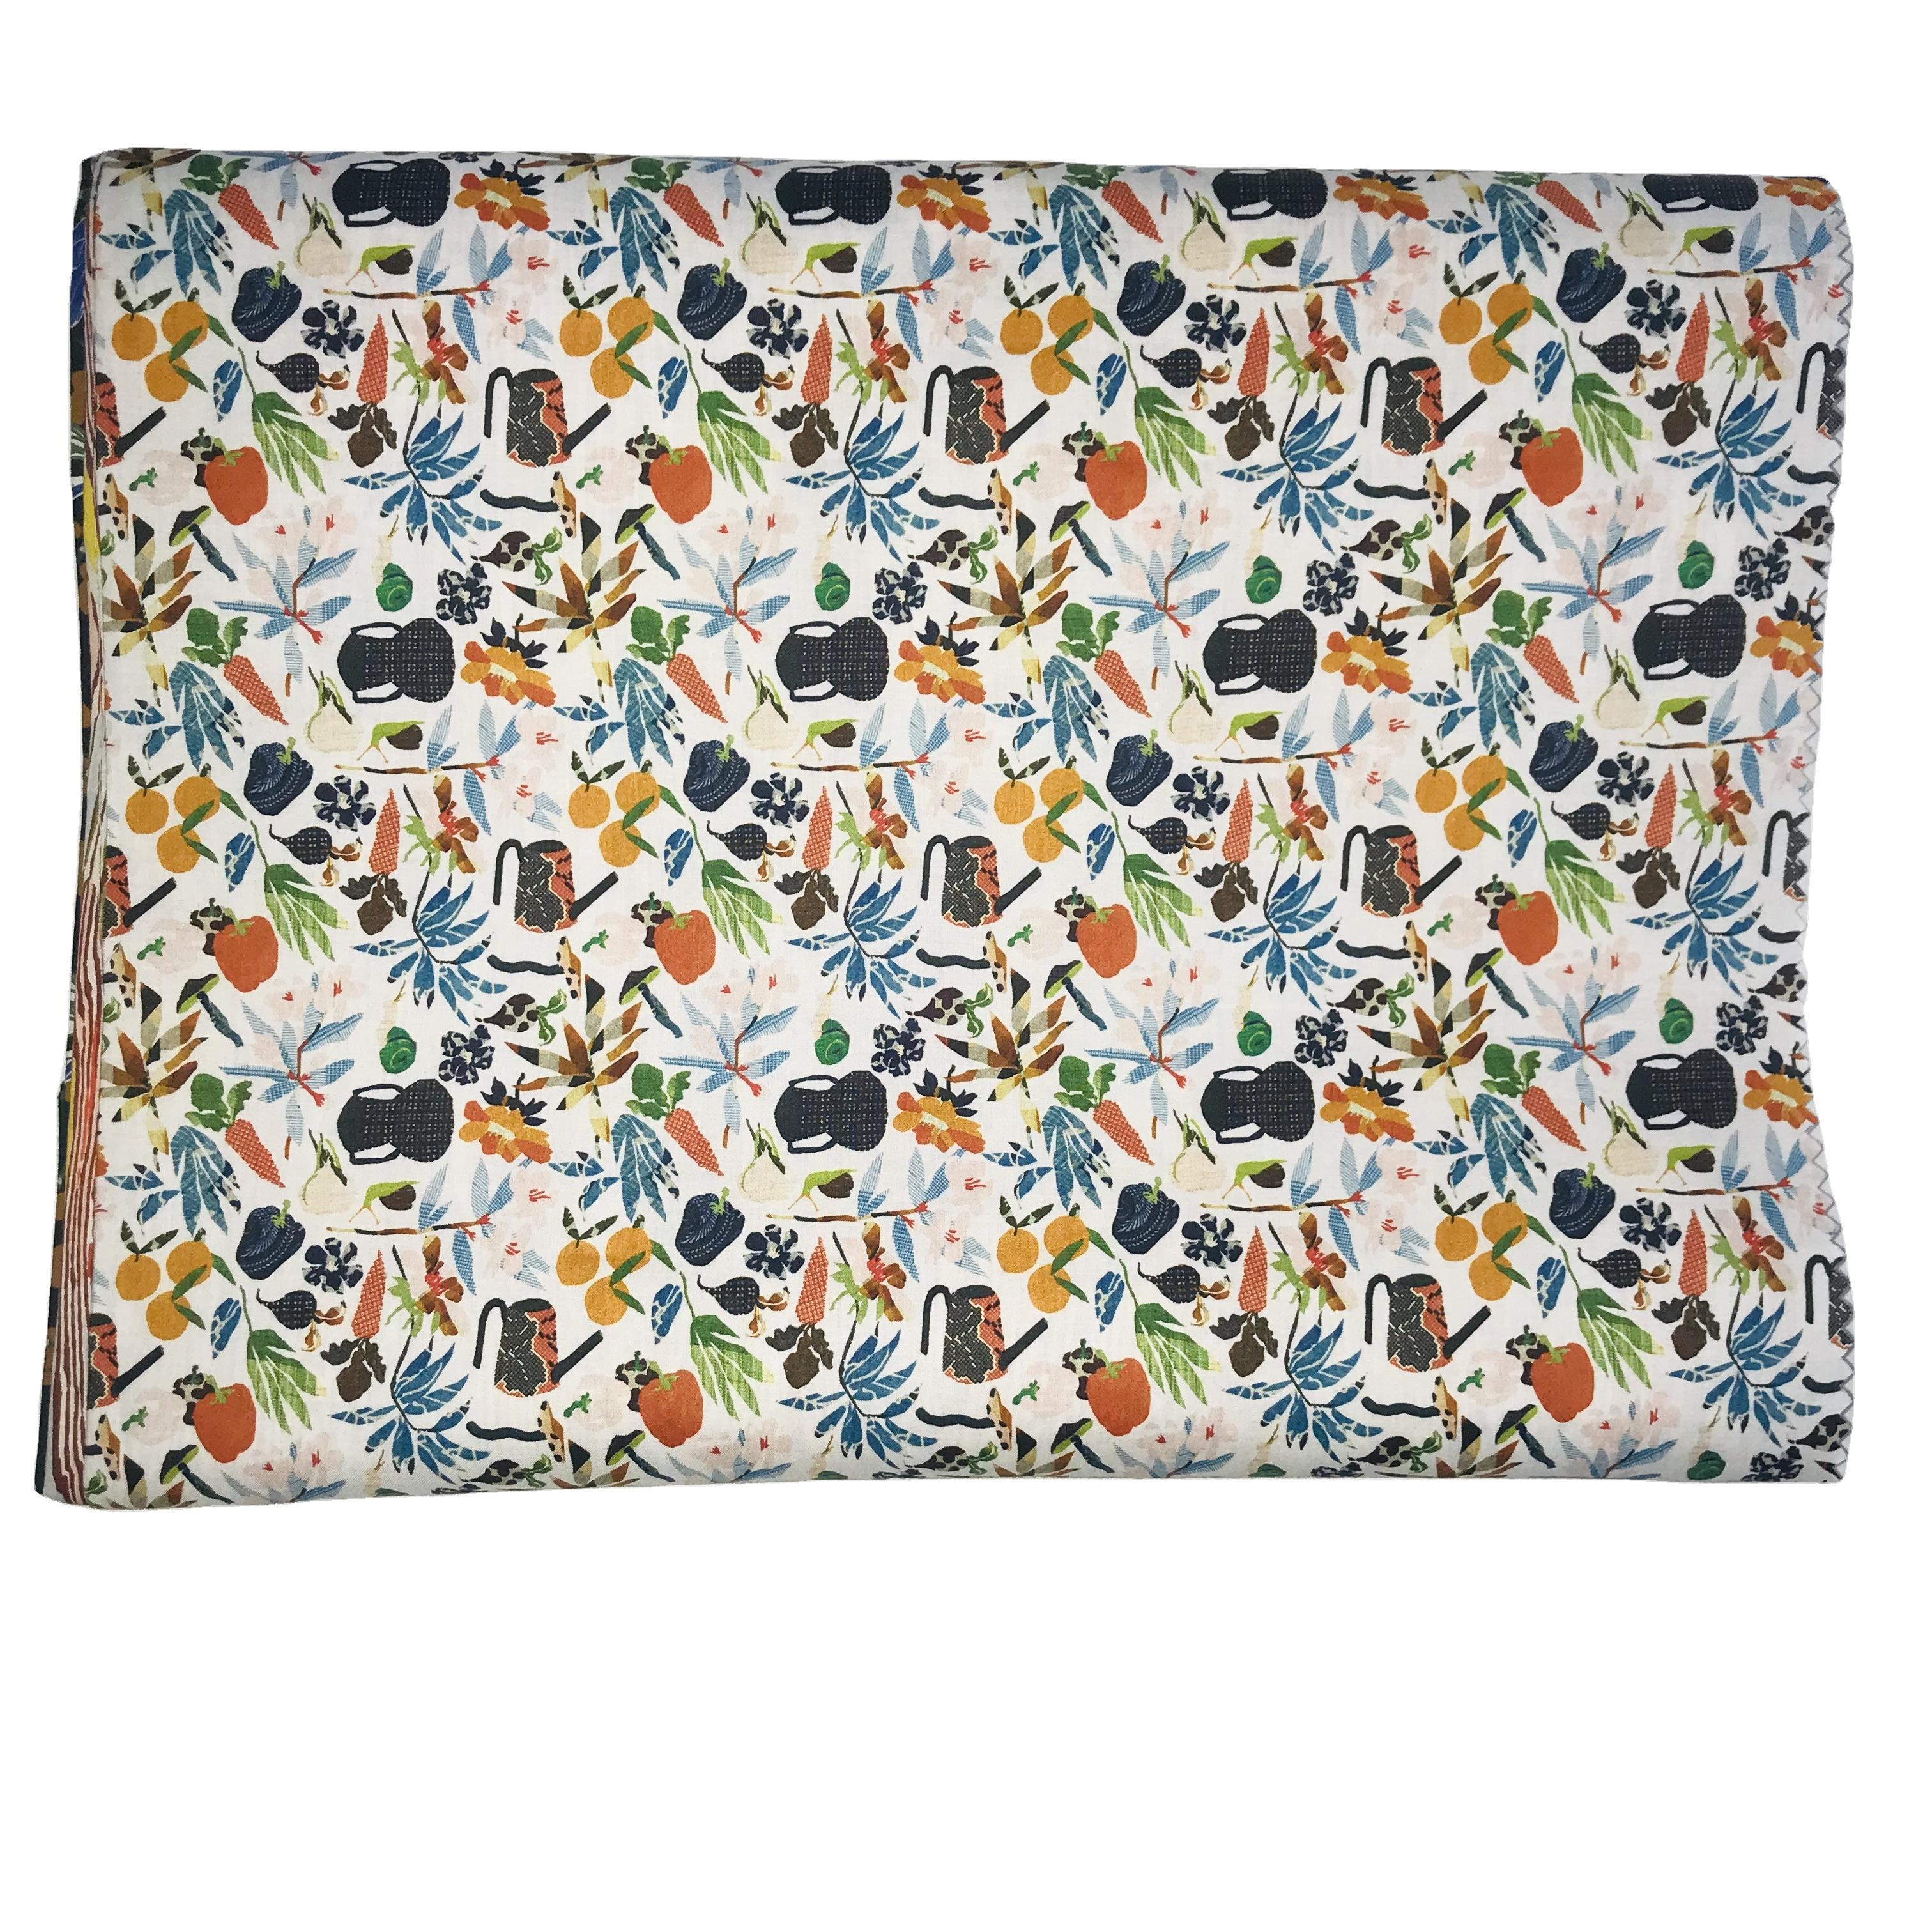 hawaiian print fabric,500 Meters